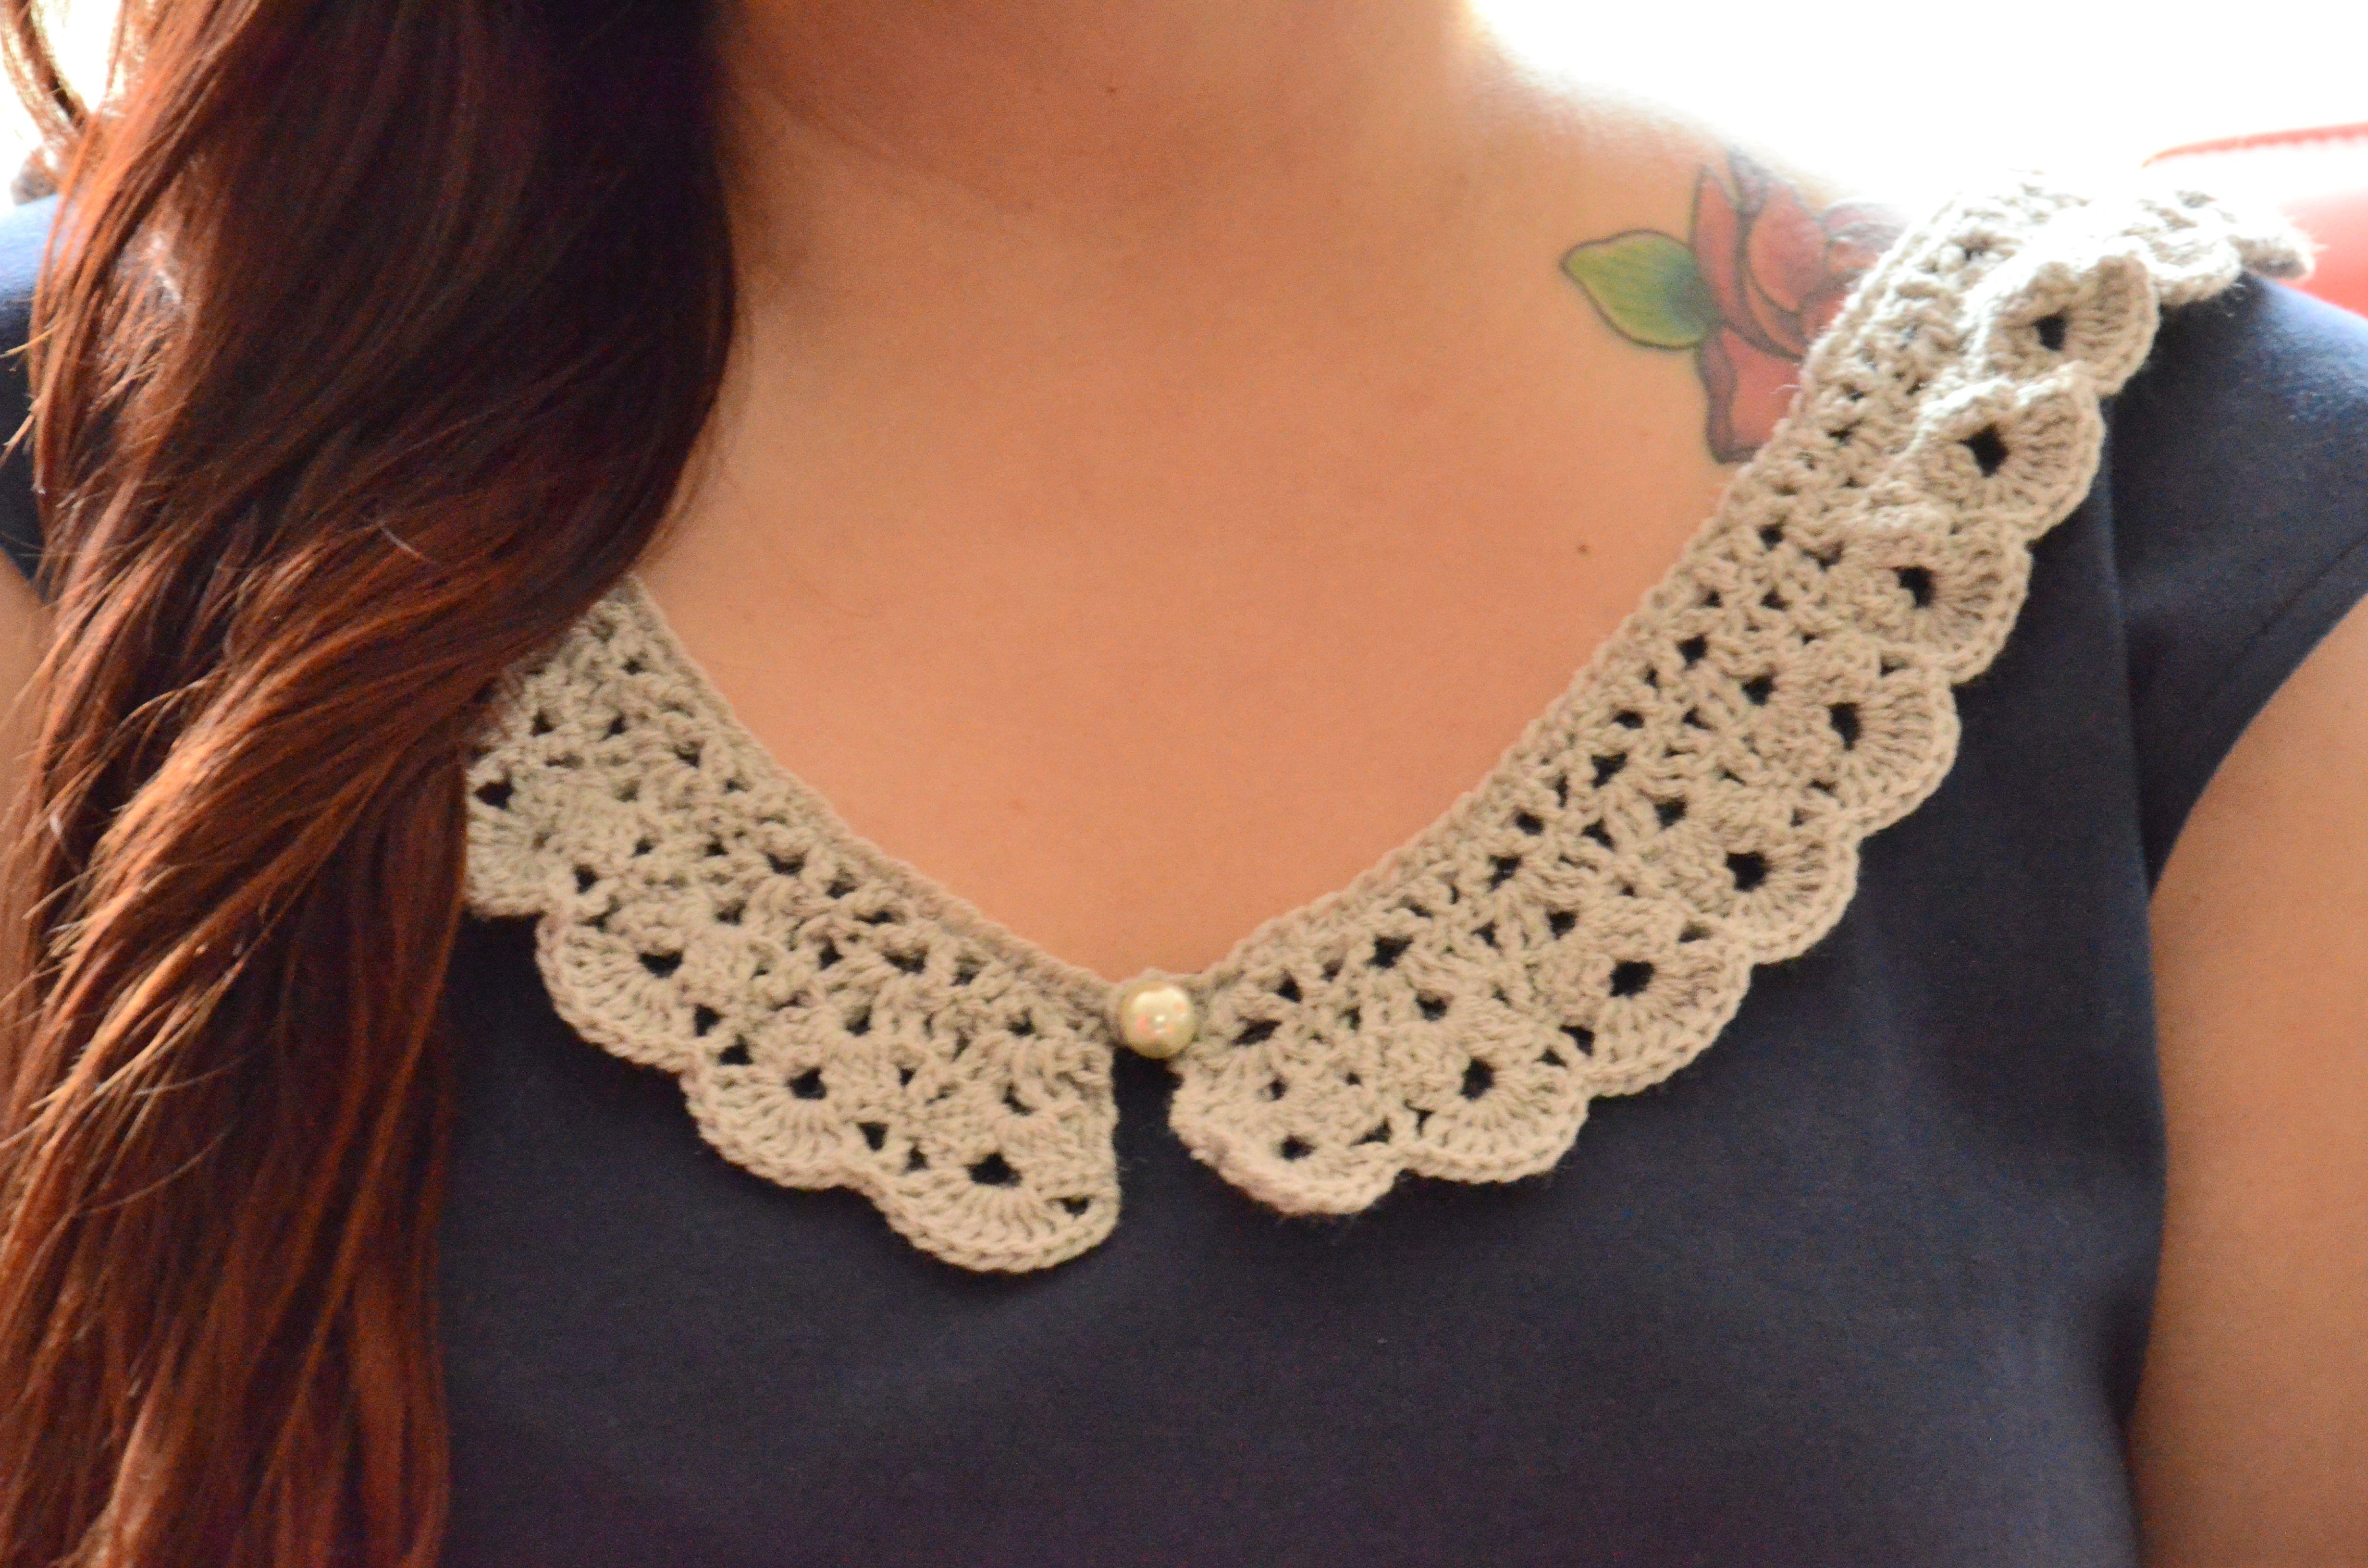 Cuello crochet para decorar blusa.